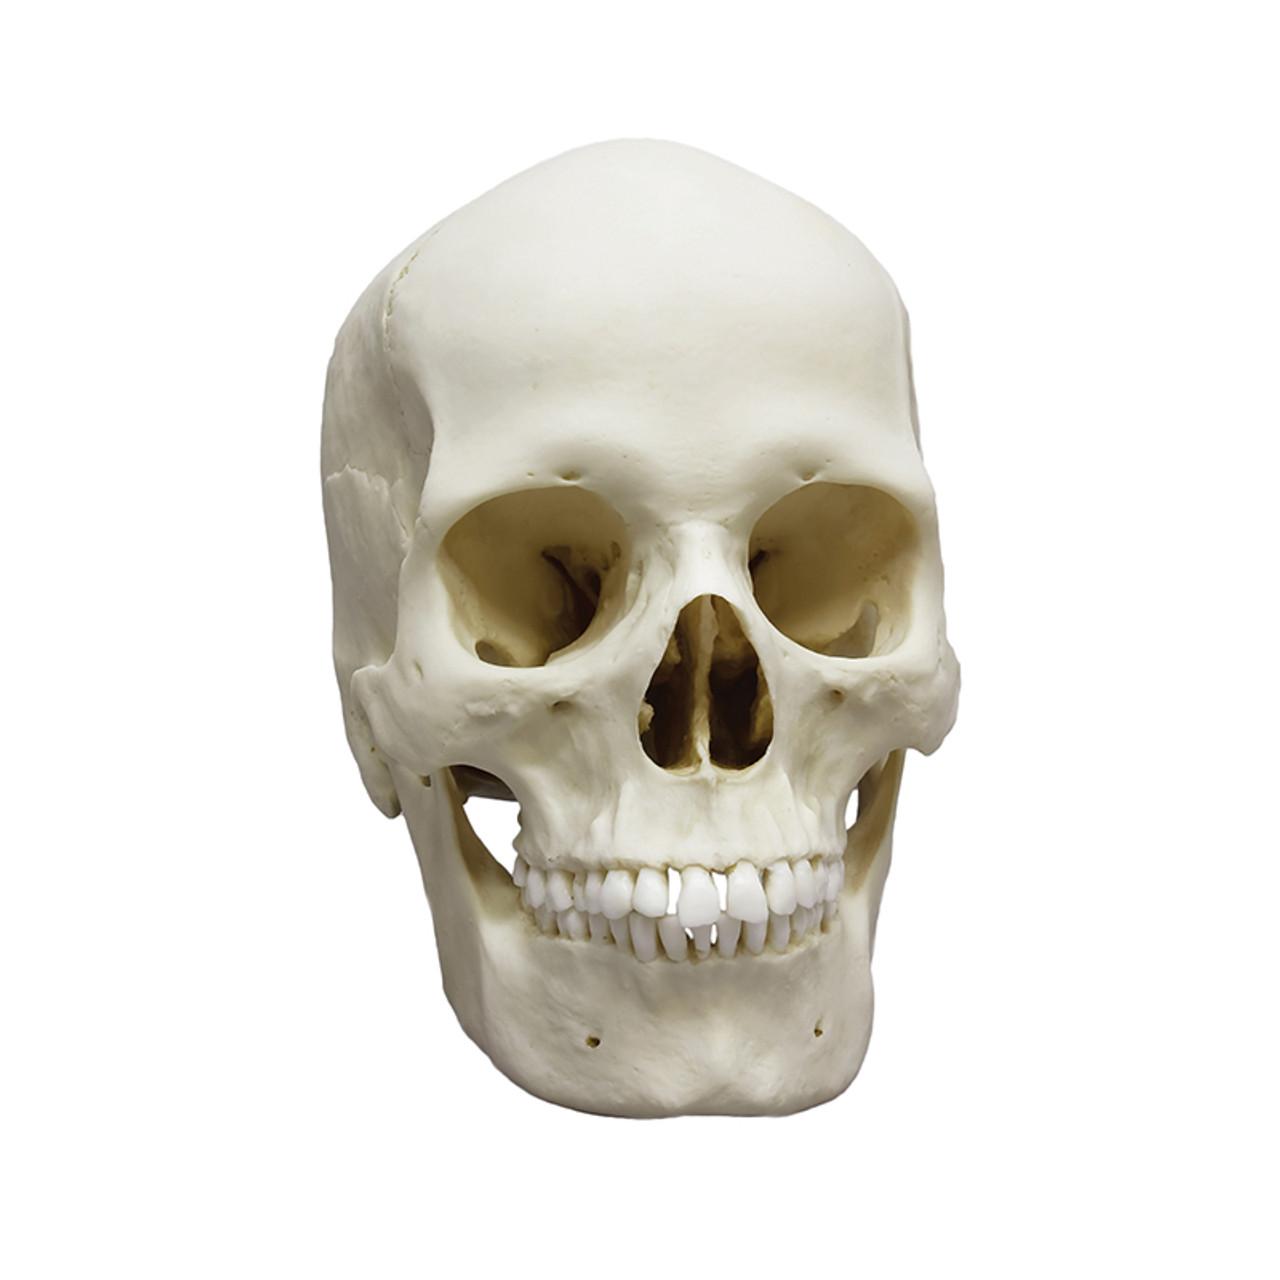 BC133 - Human female European skull